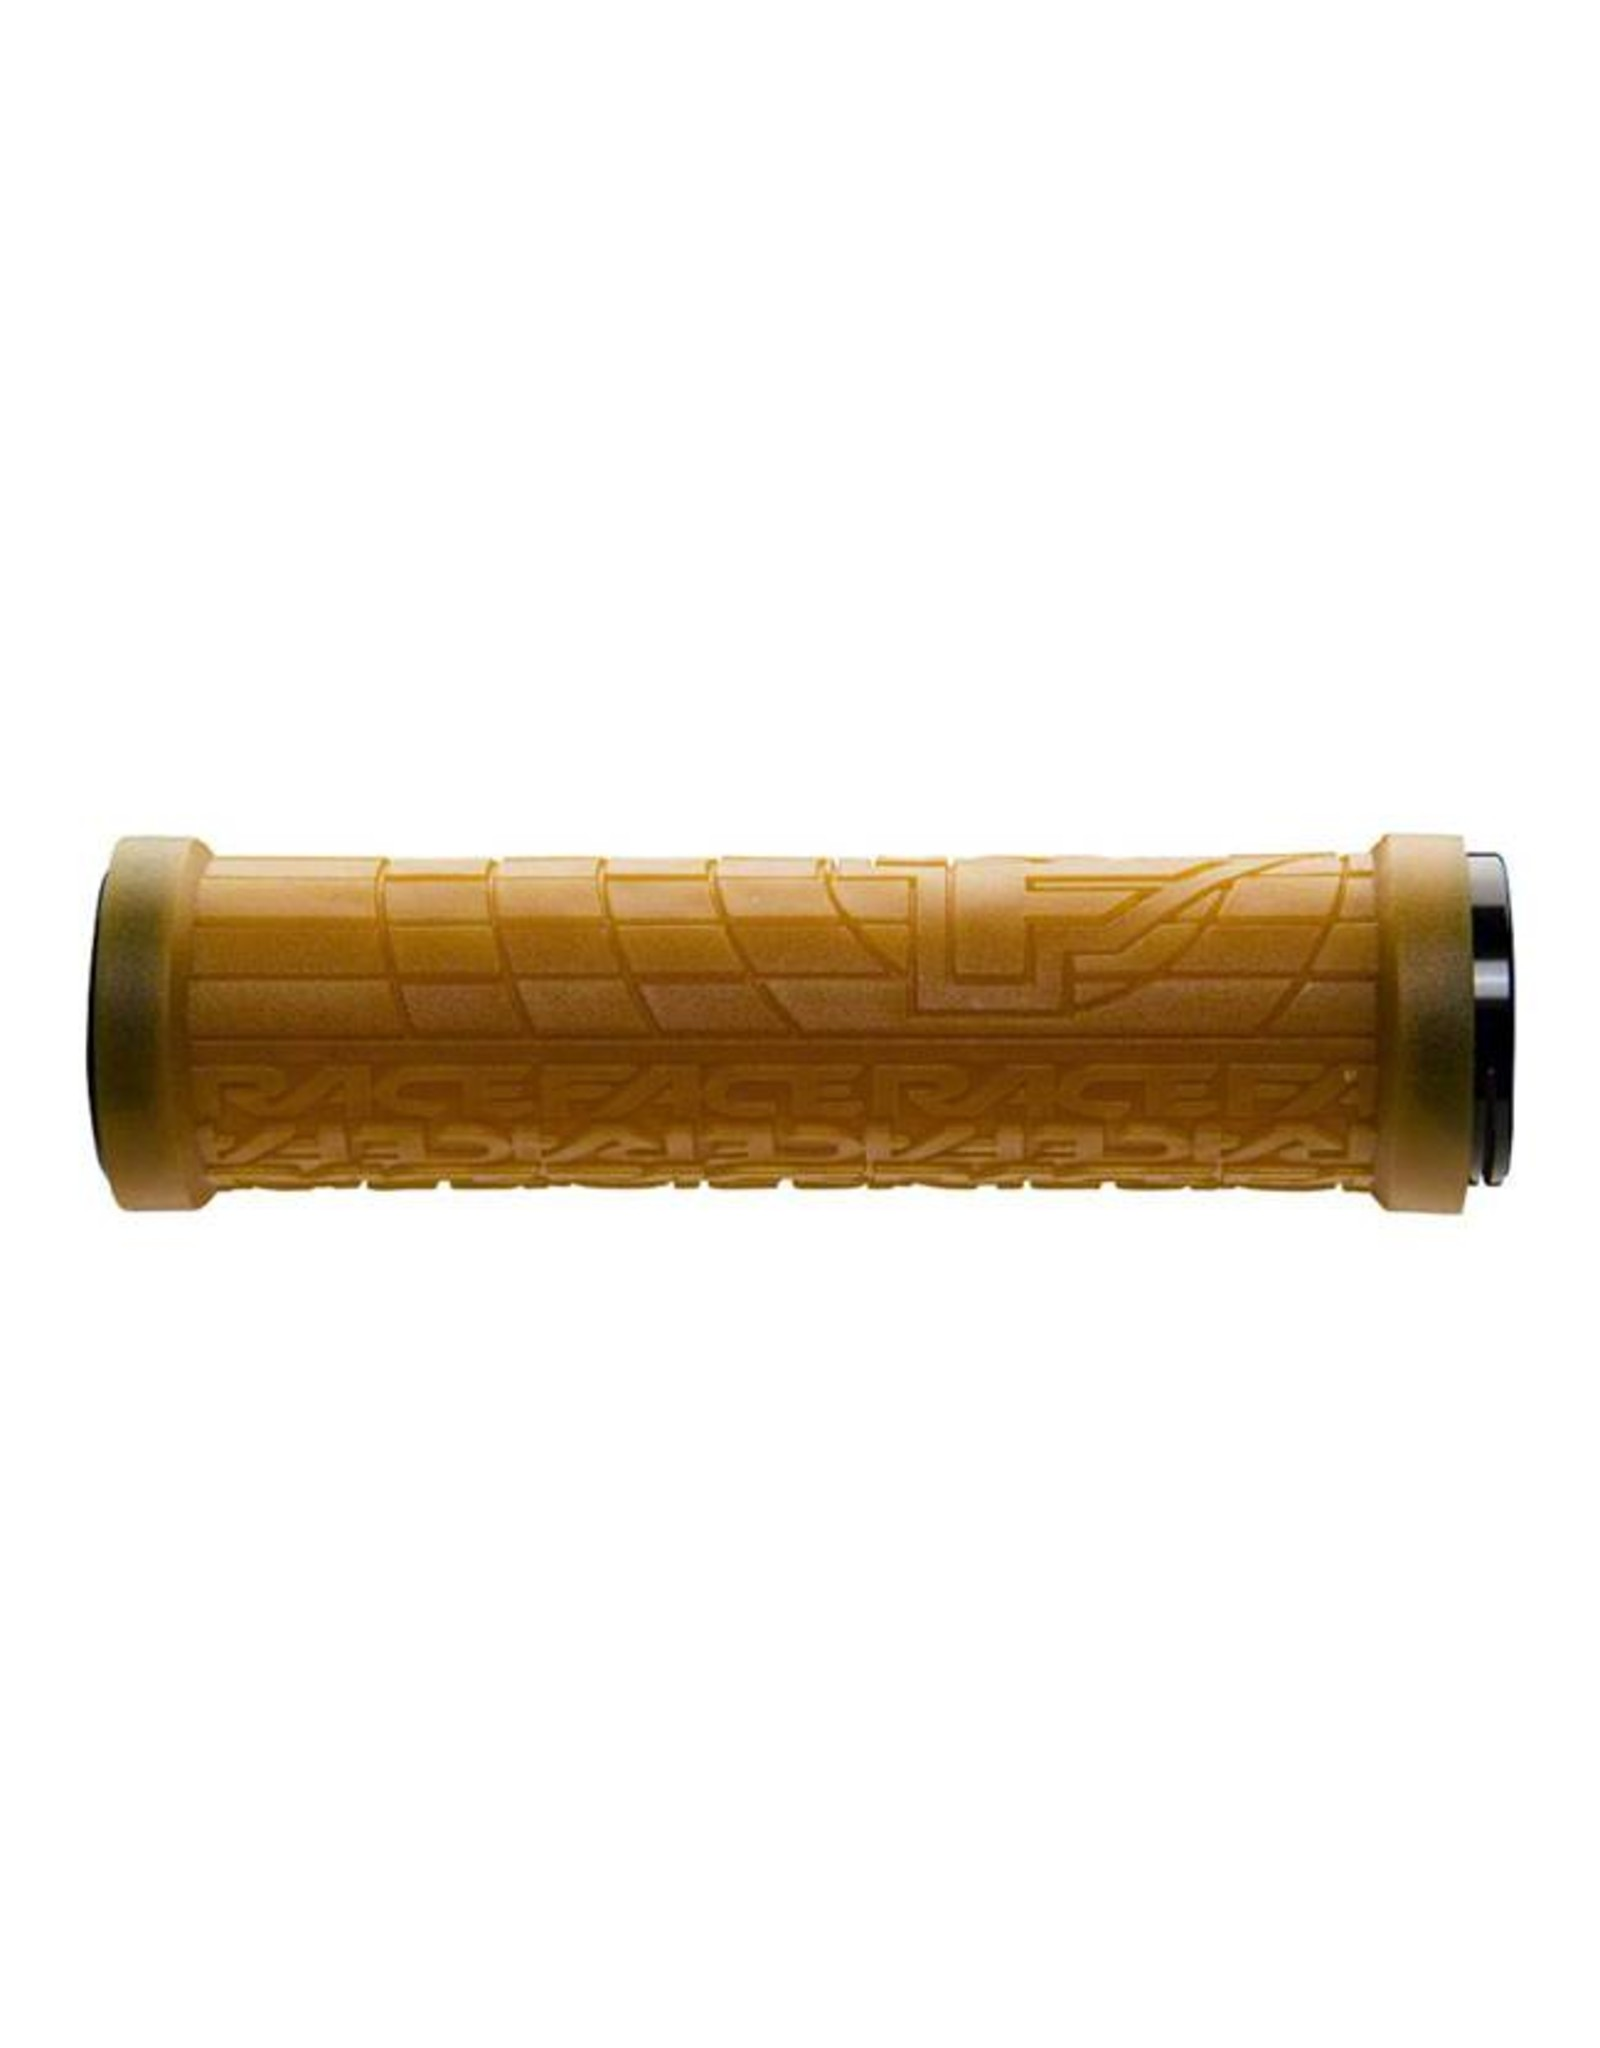 RaceFace RaceFace Grippler 30mm Lock-On Grip Gum